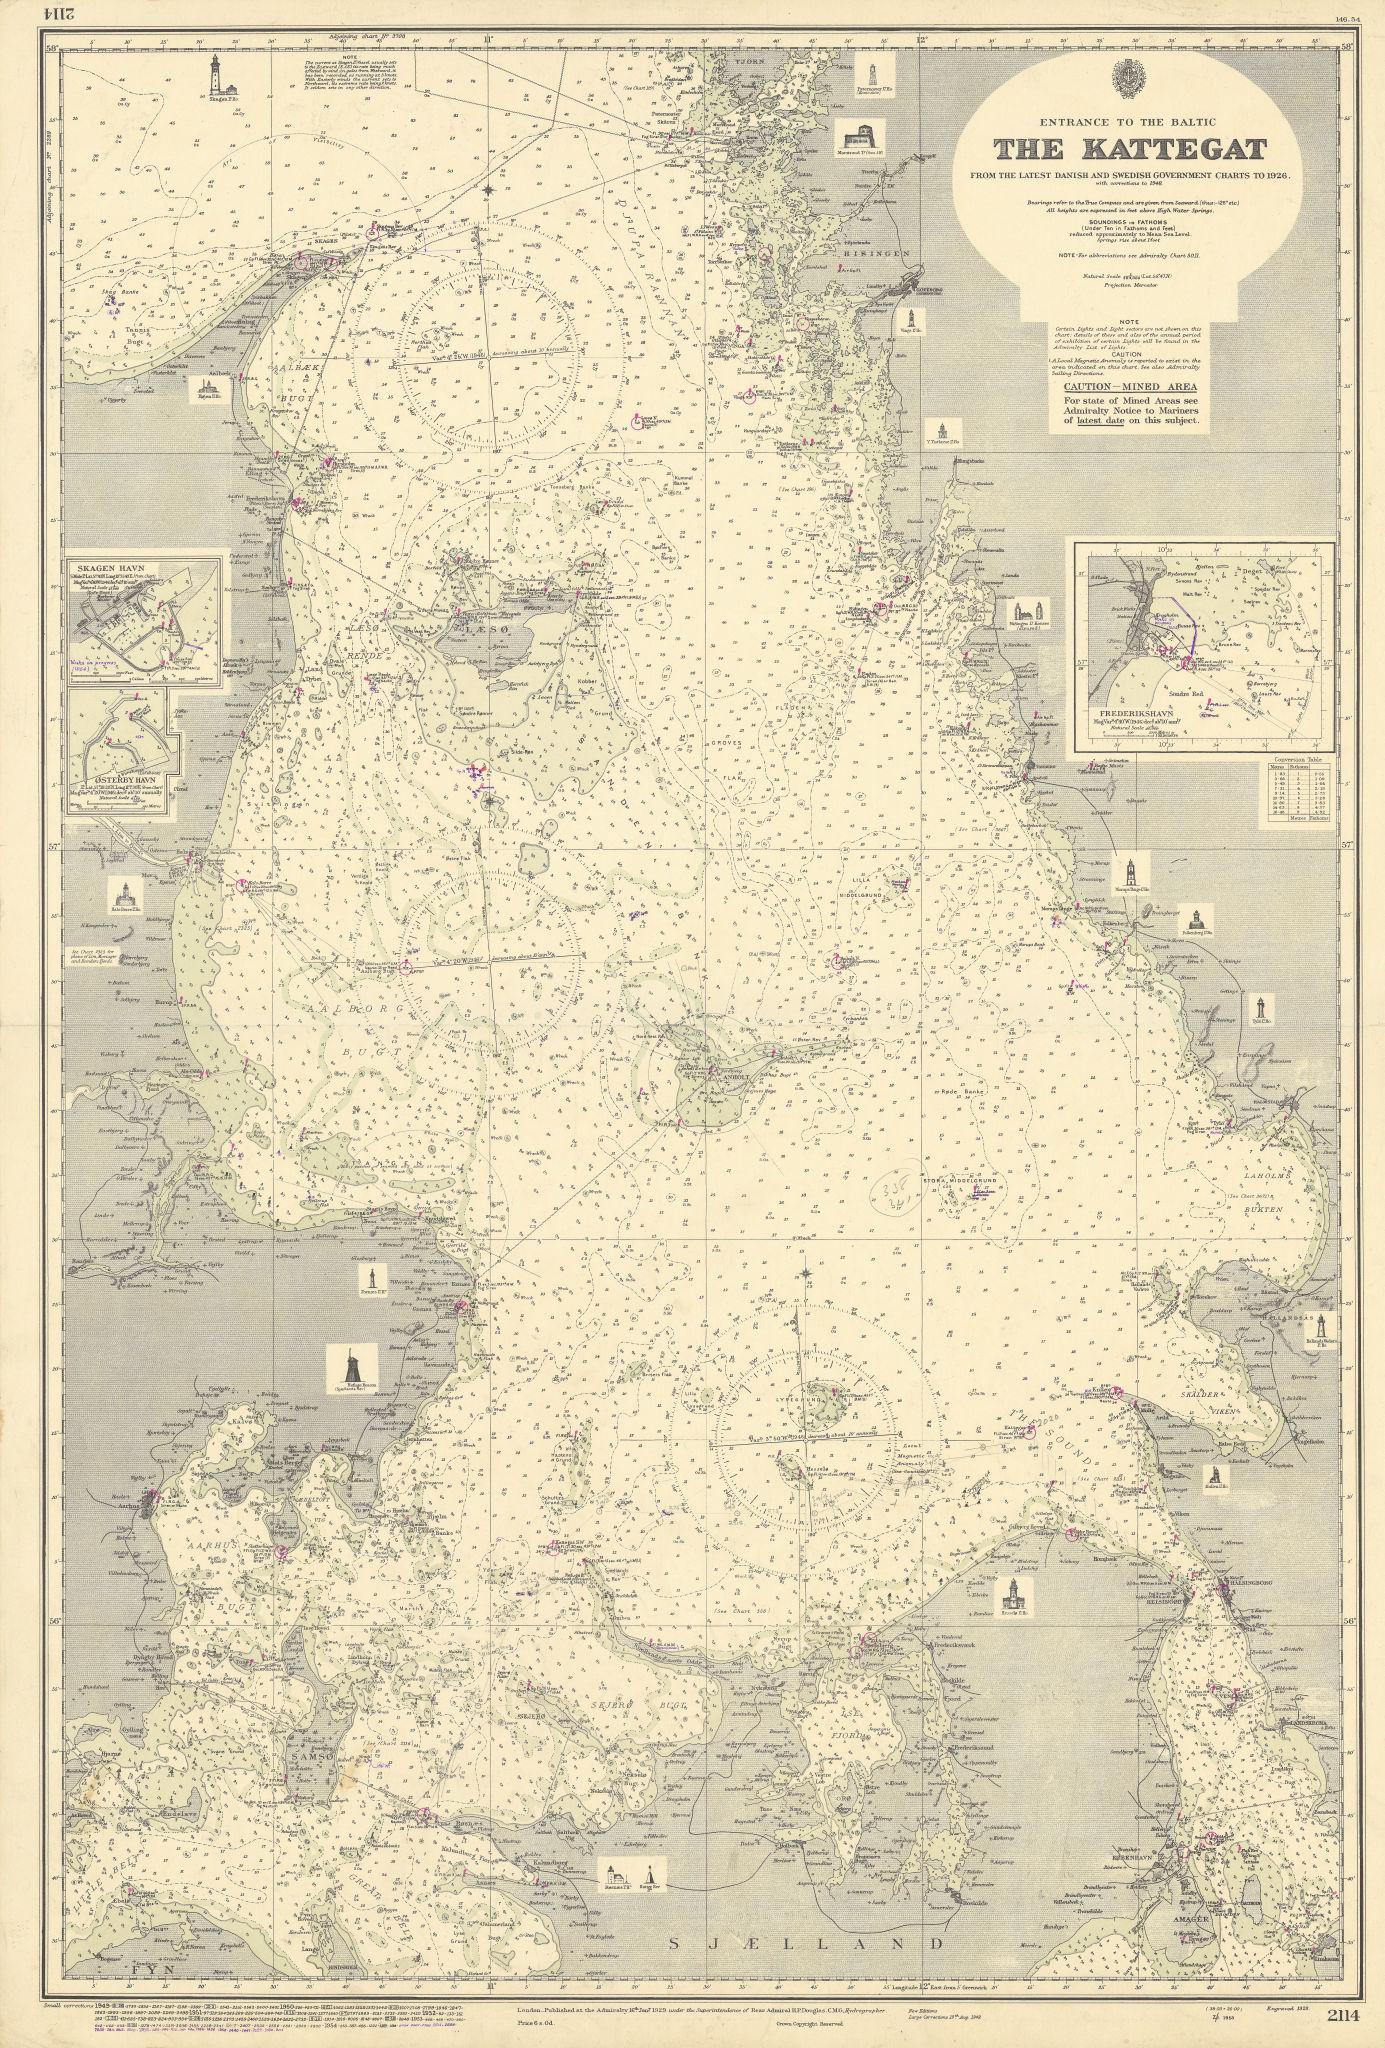 Kattegat Baltic ports lighthouses Denmark Sweden ADMIRALTY chart 1929 (1955) map